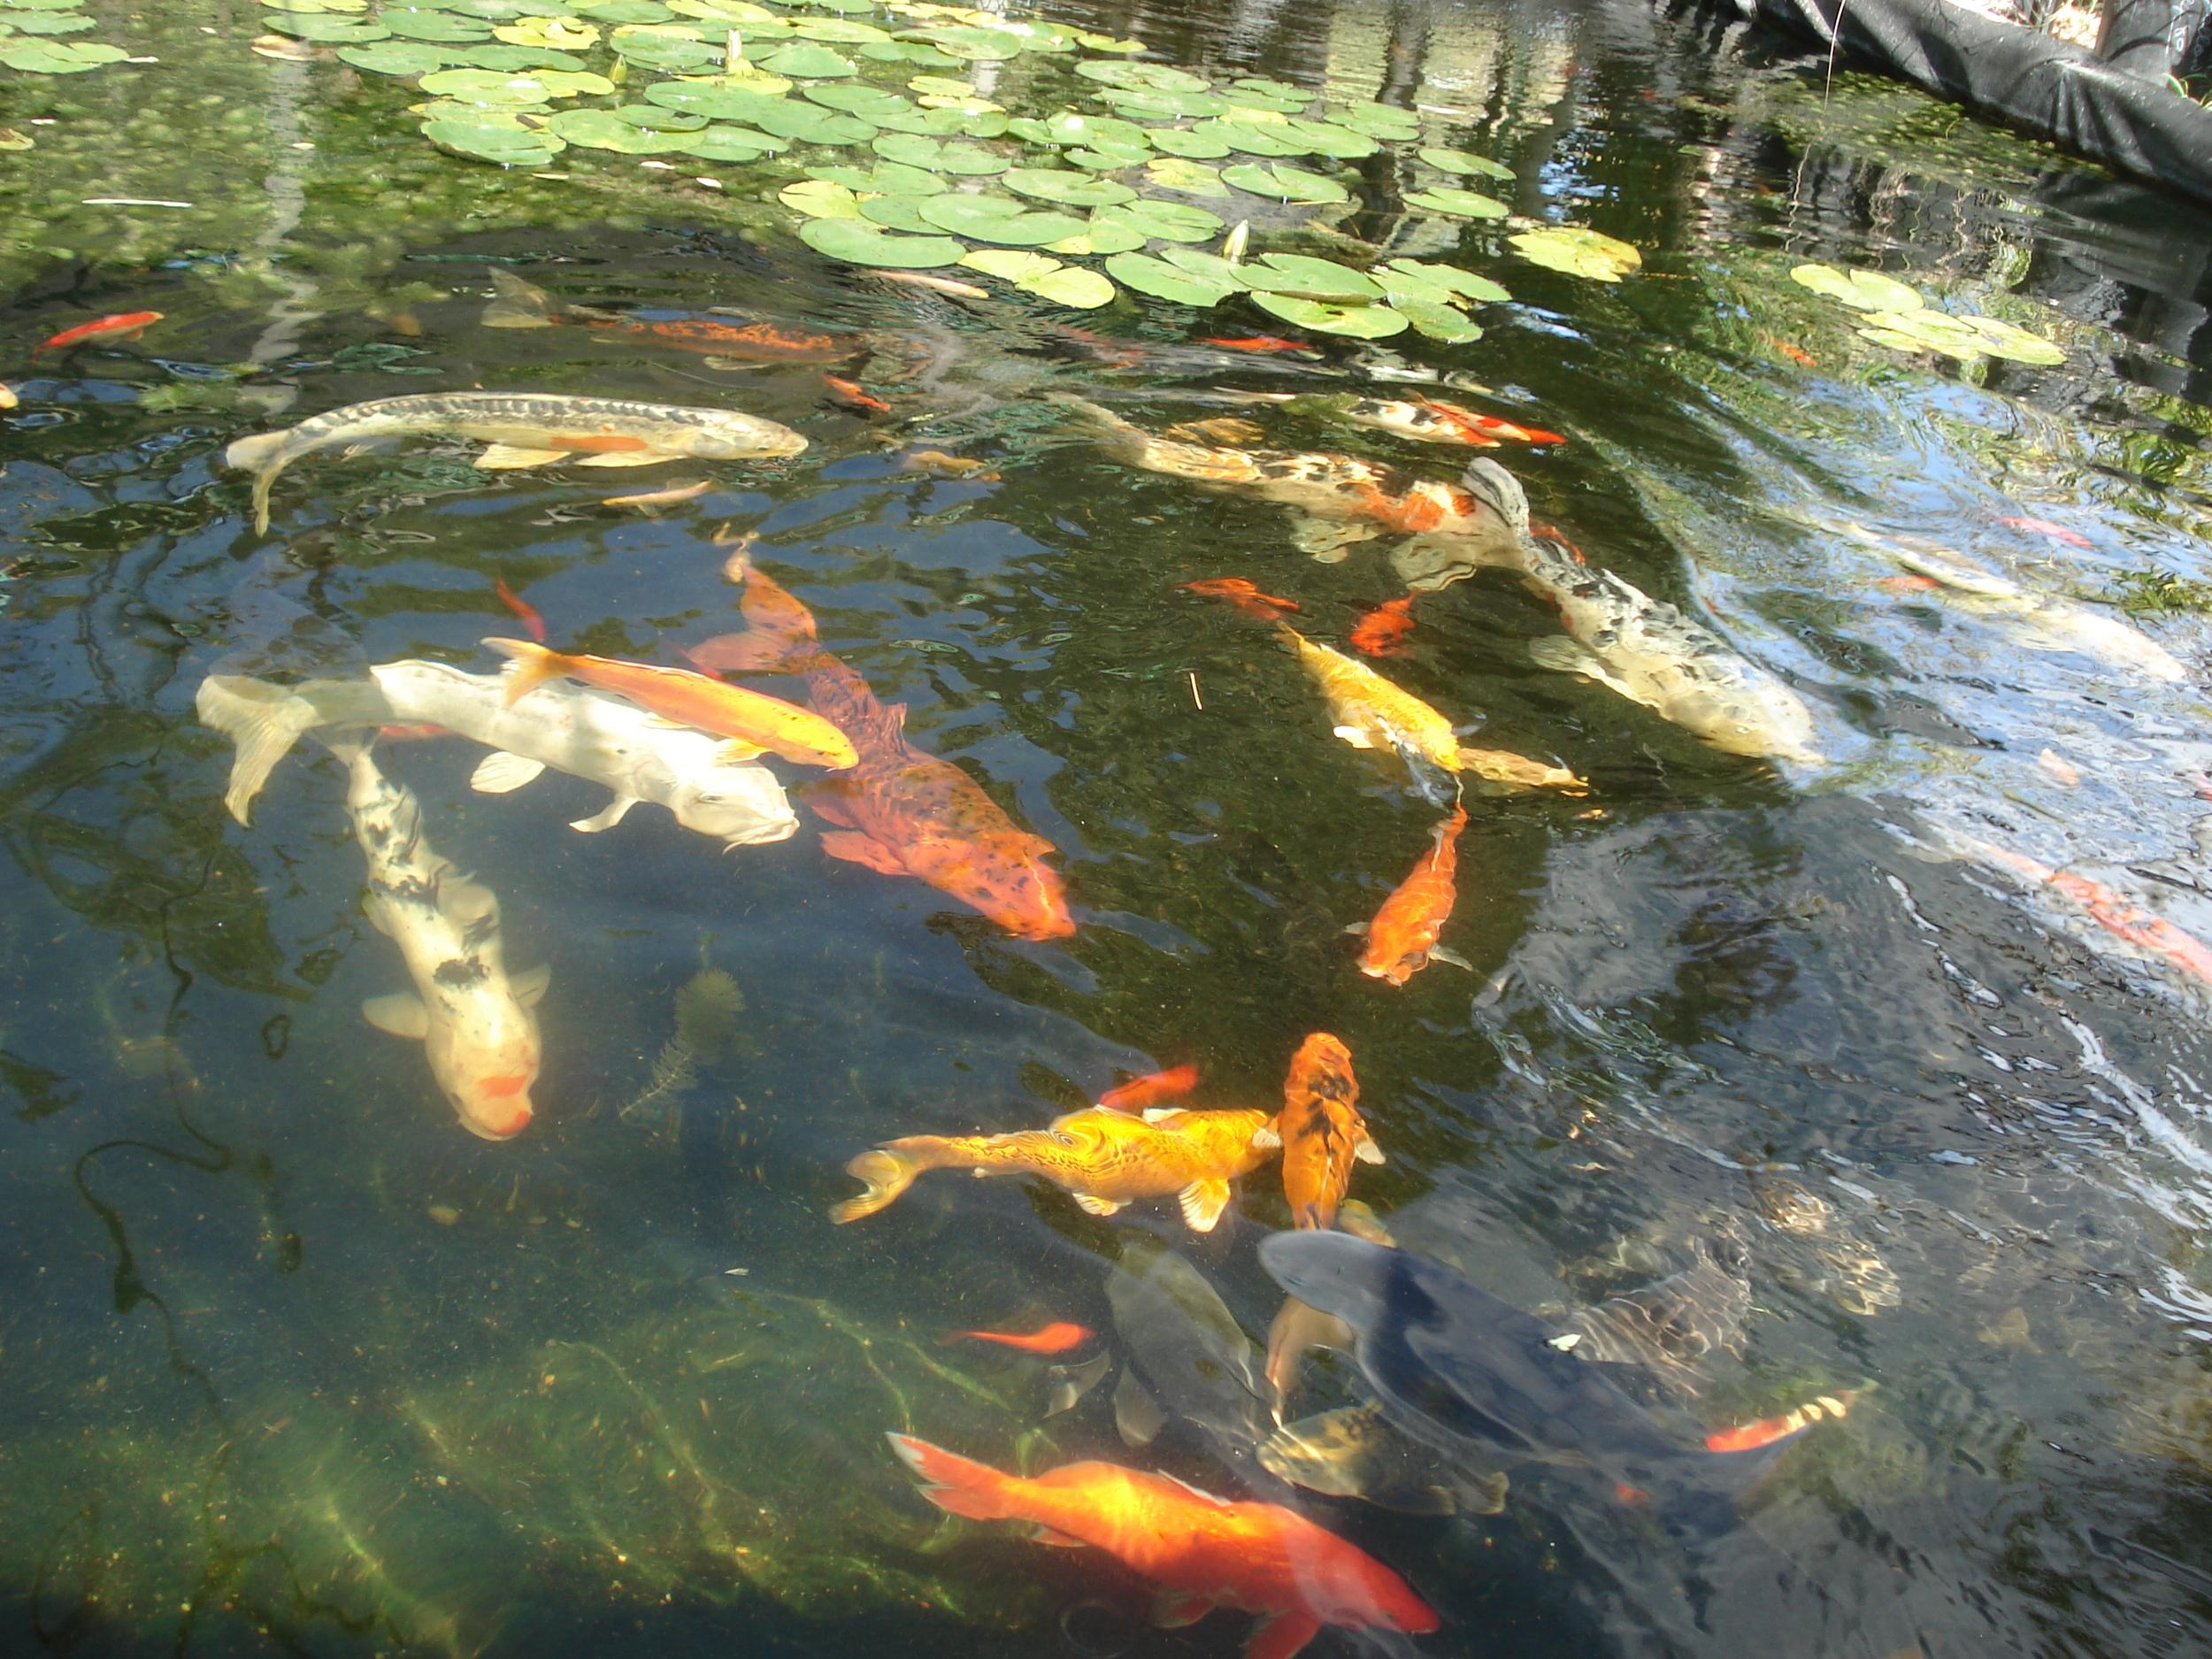 Pond & Fish Supplies